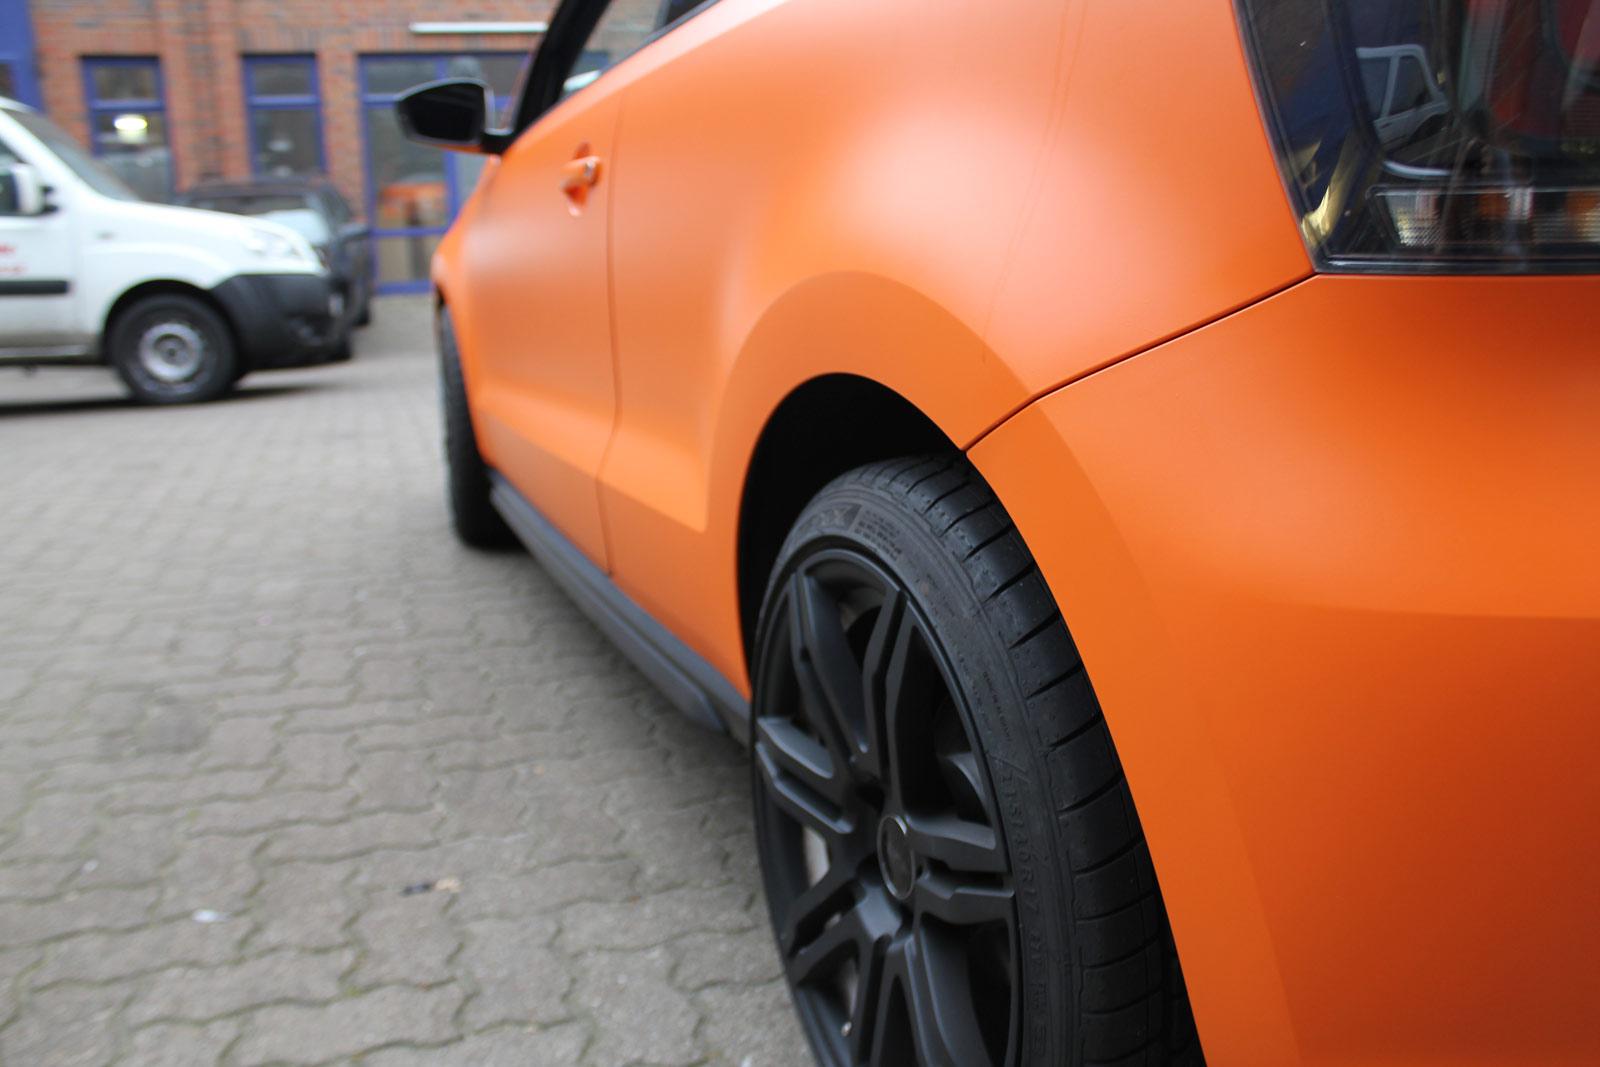 VW_Polo_GTI_Folierung_Orange_Matt_18